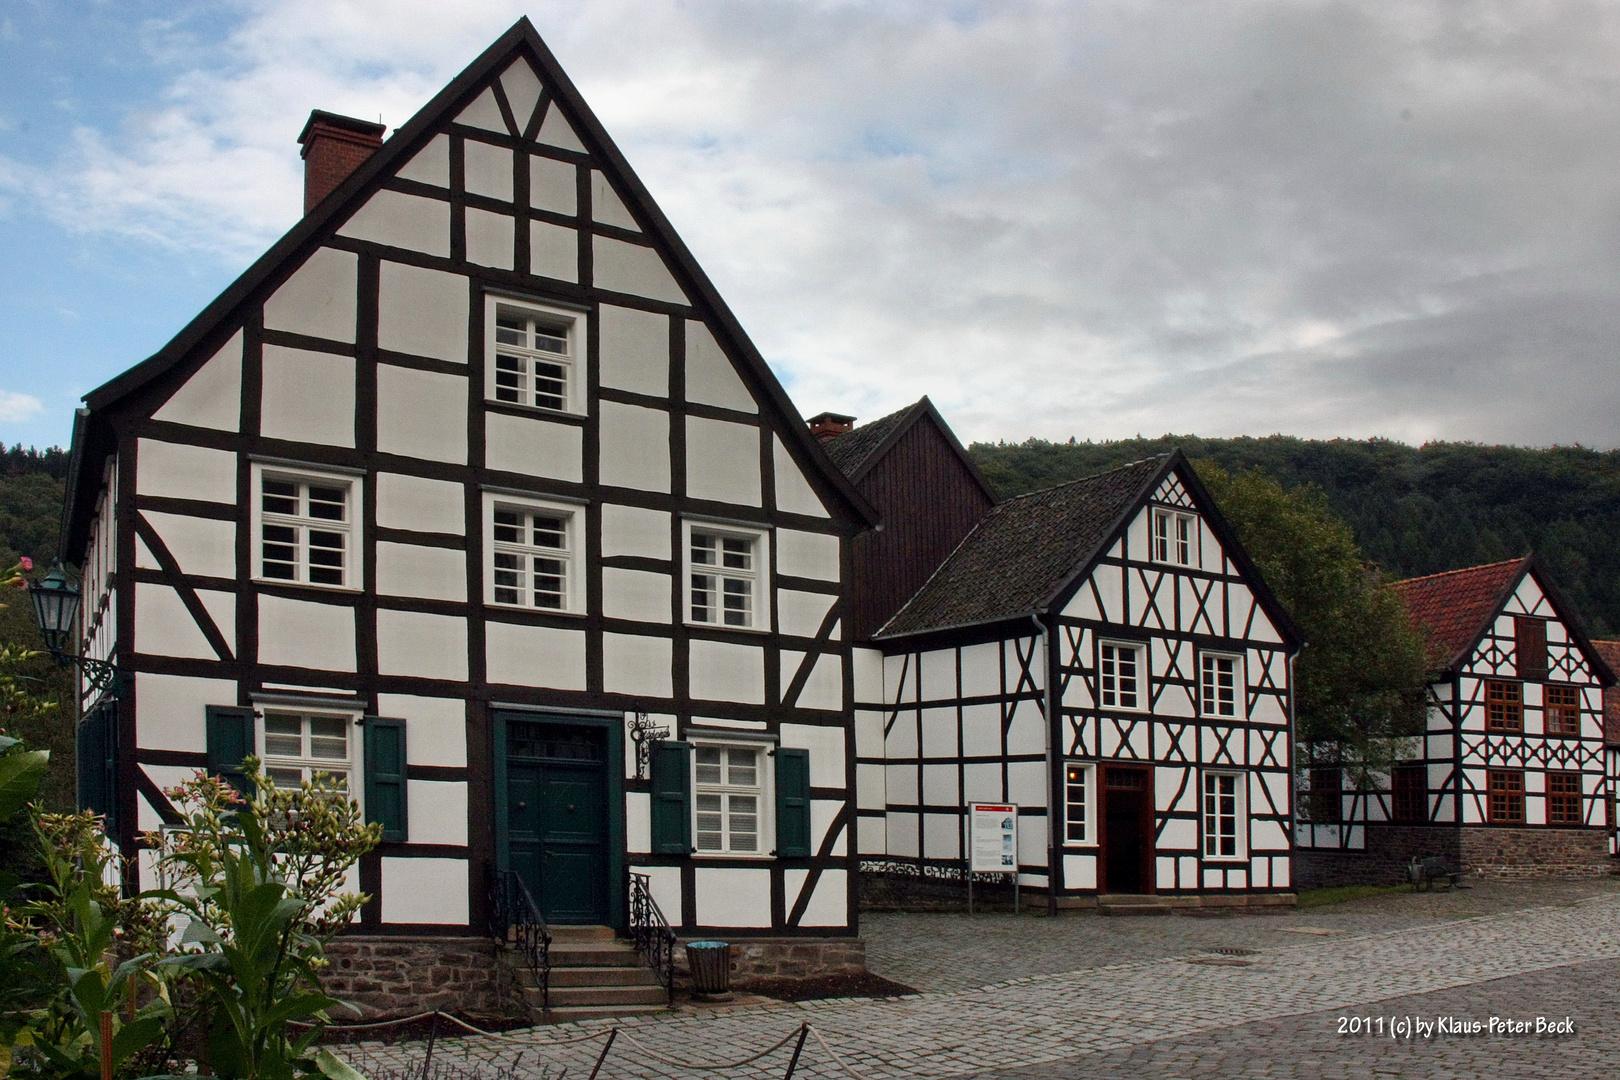 Museumsdorf Hagen